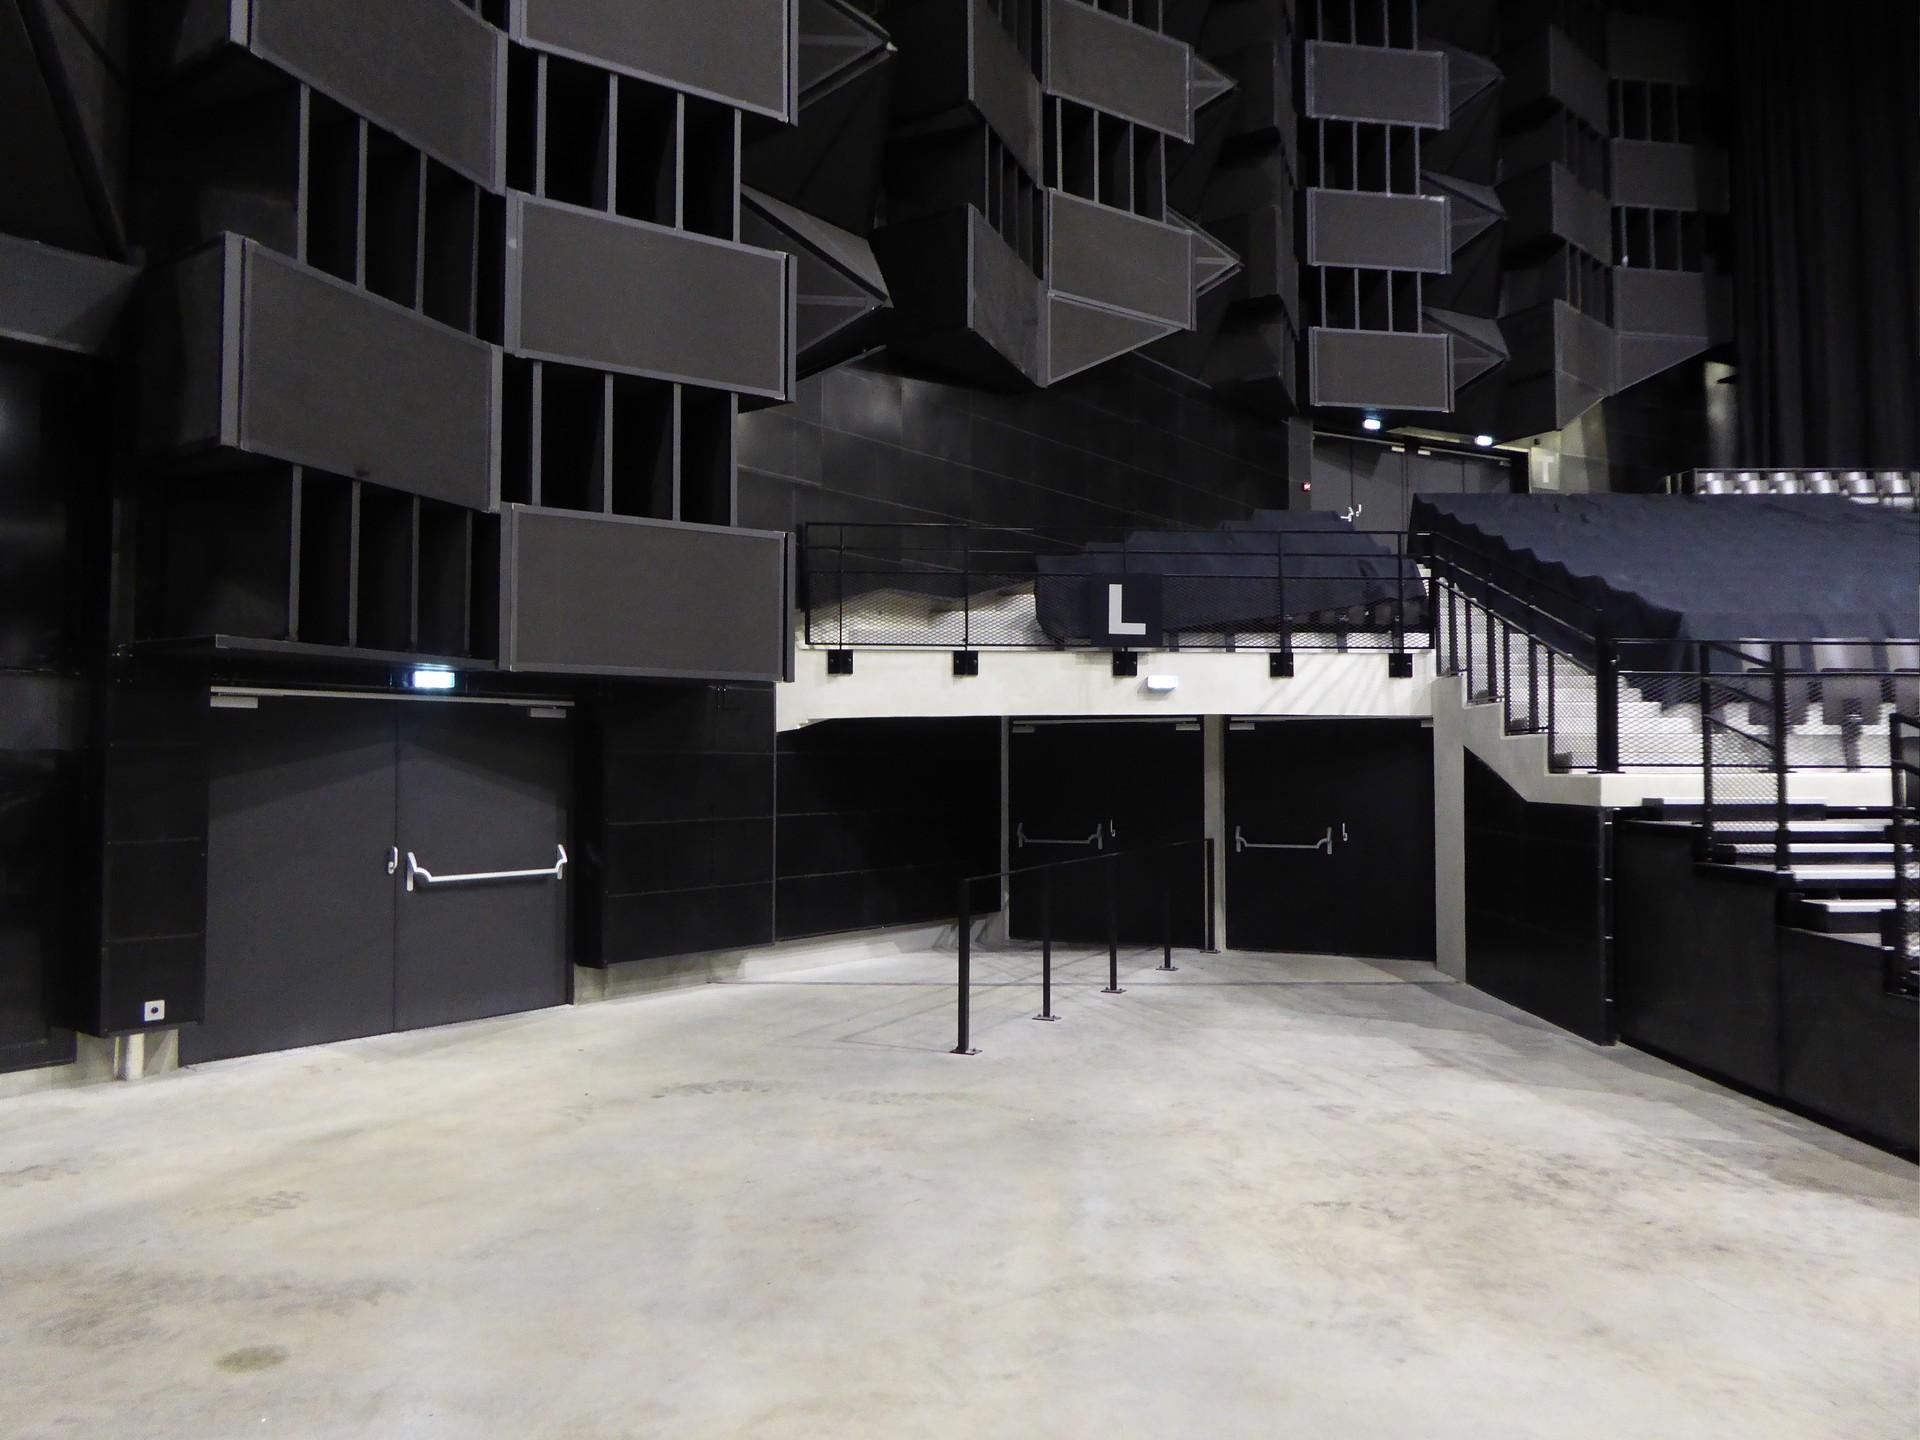 DOORTAL - Bordeaux métroploe Aréna- Porte phoniplus